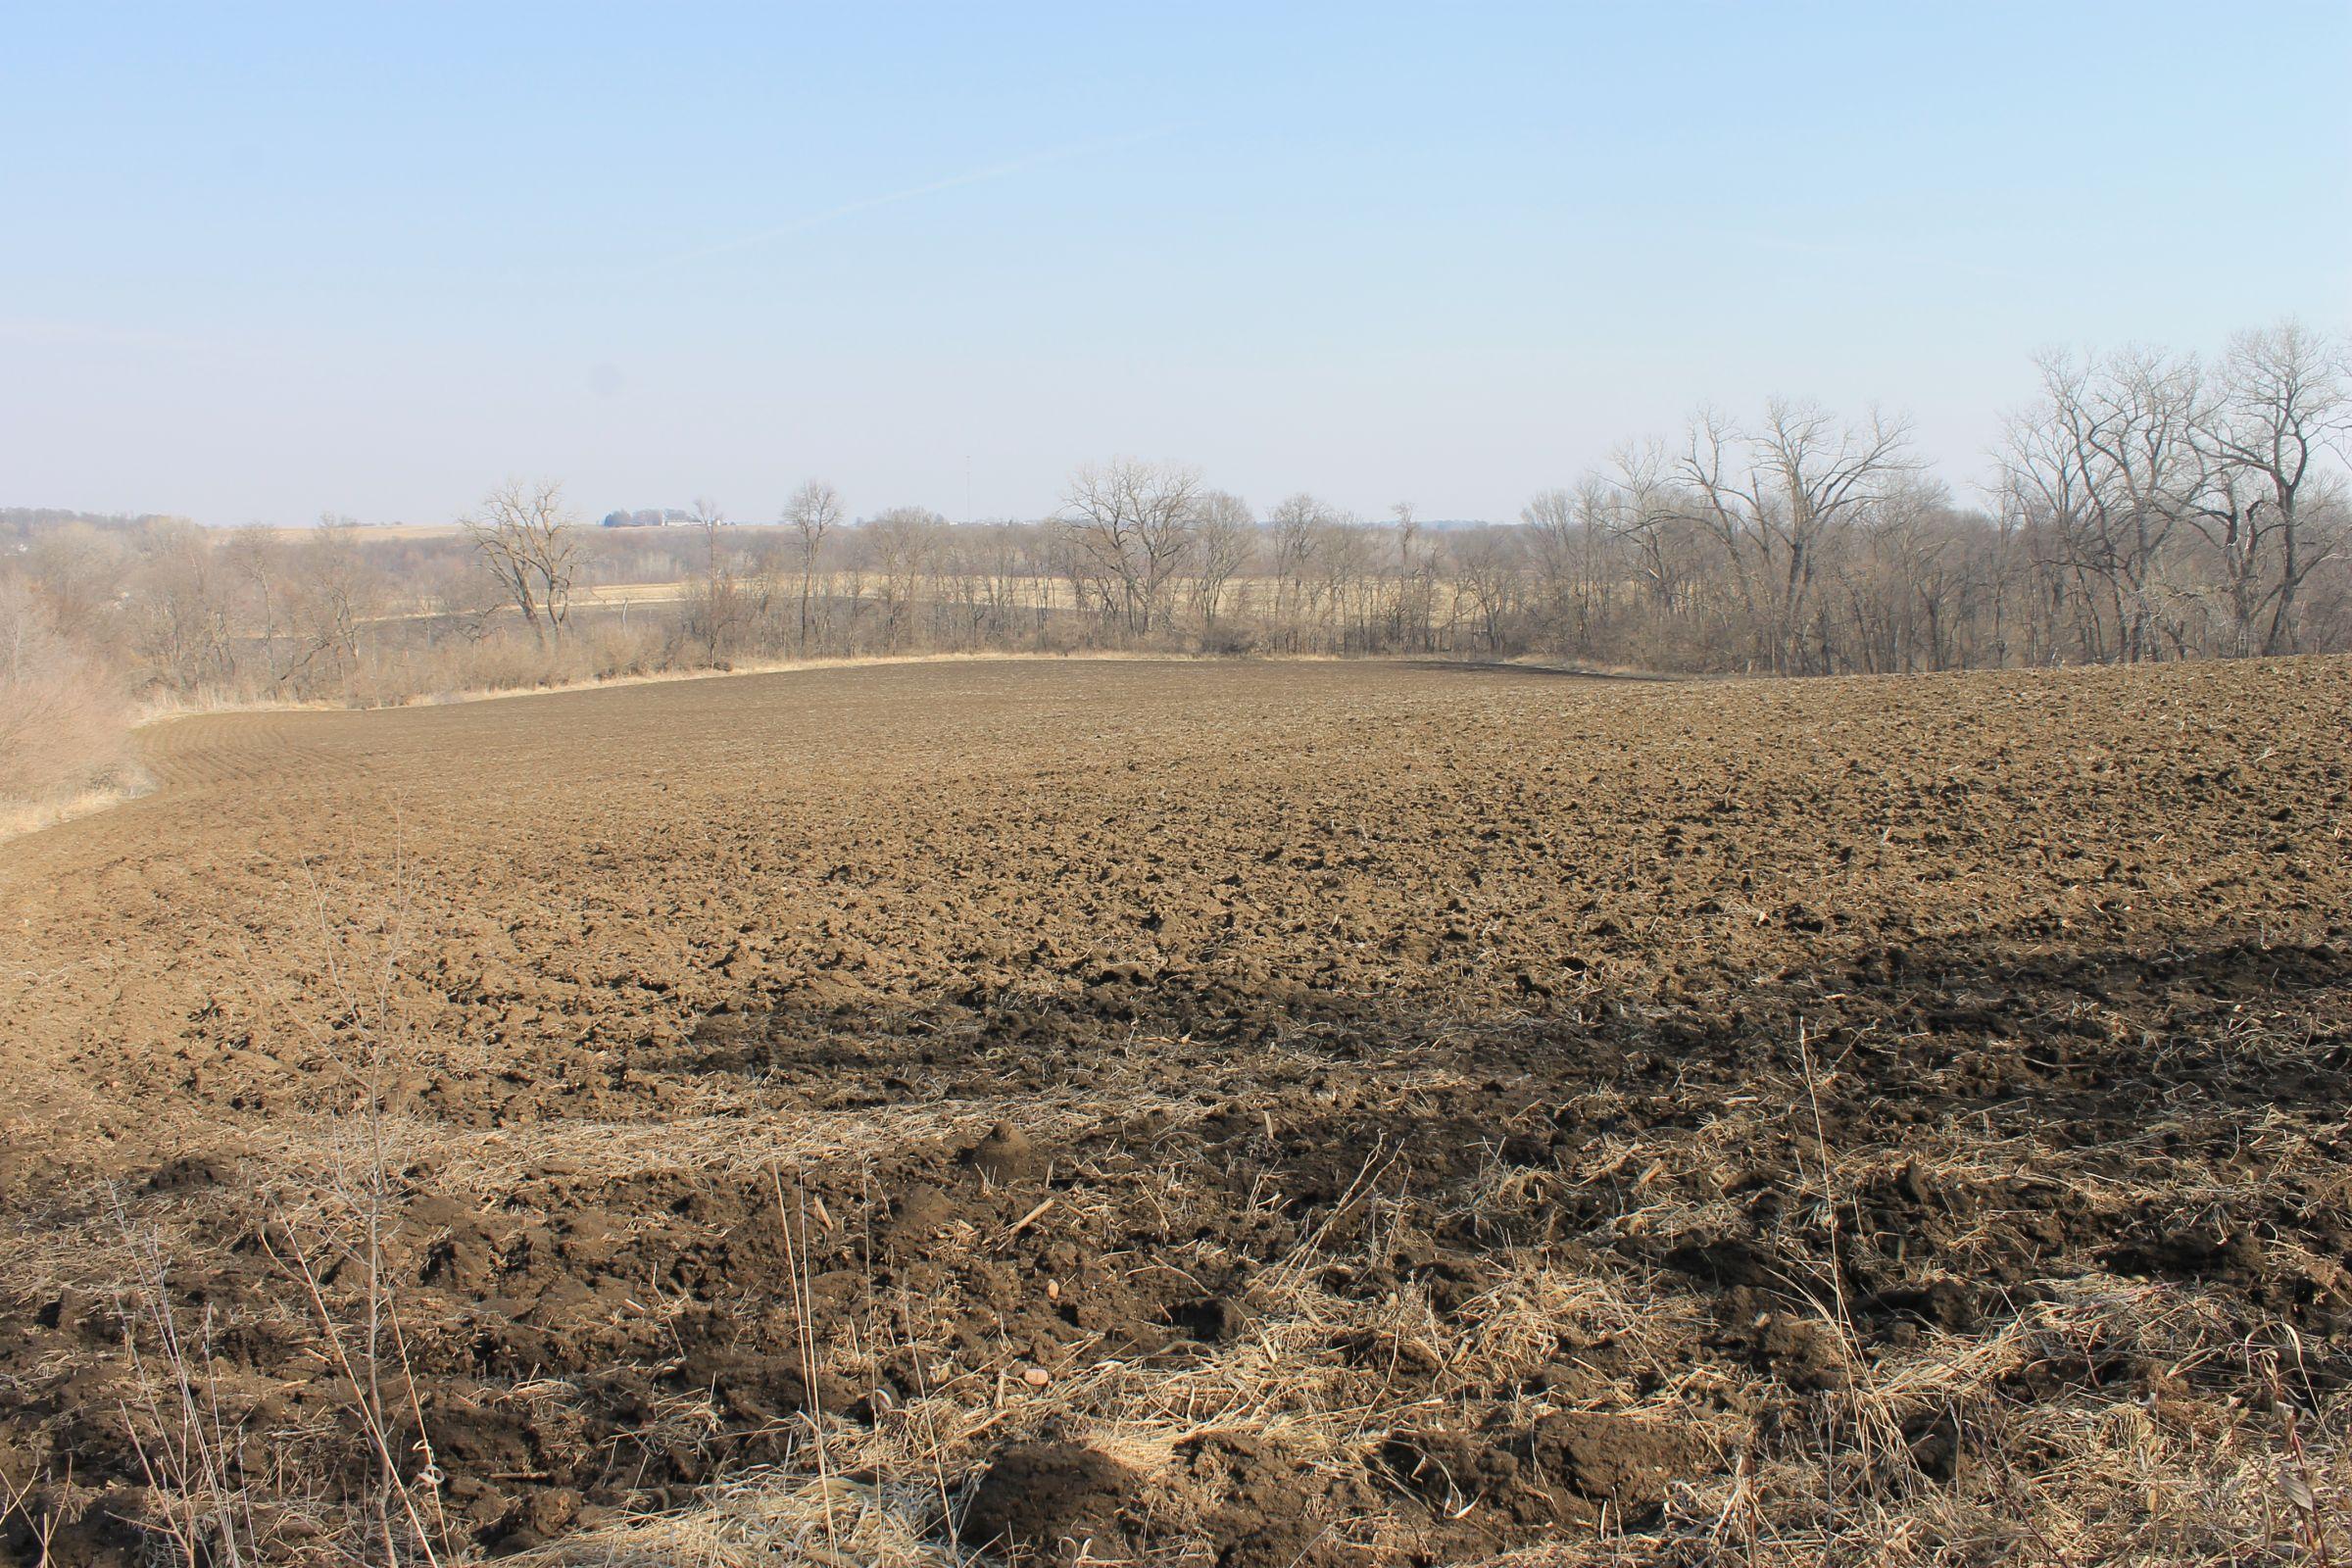 land-warren-county-iowa-16-acres-listing-number-15374-2-2021-03-09-173944.JPG